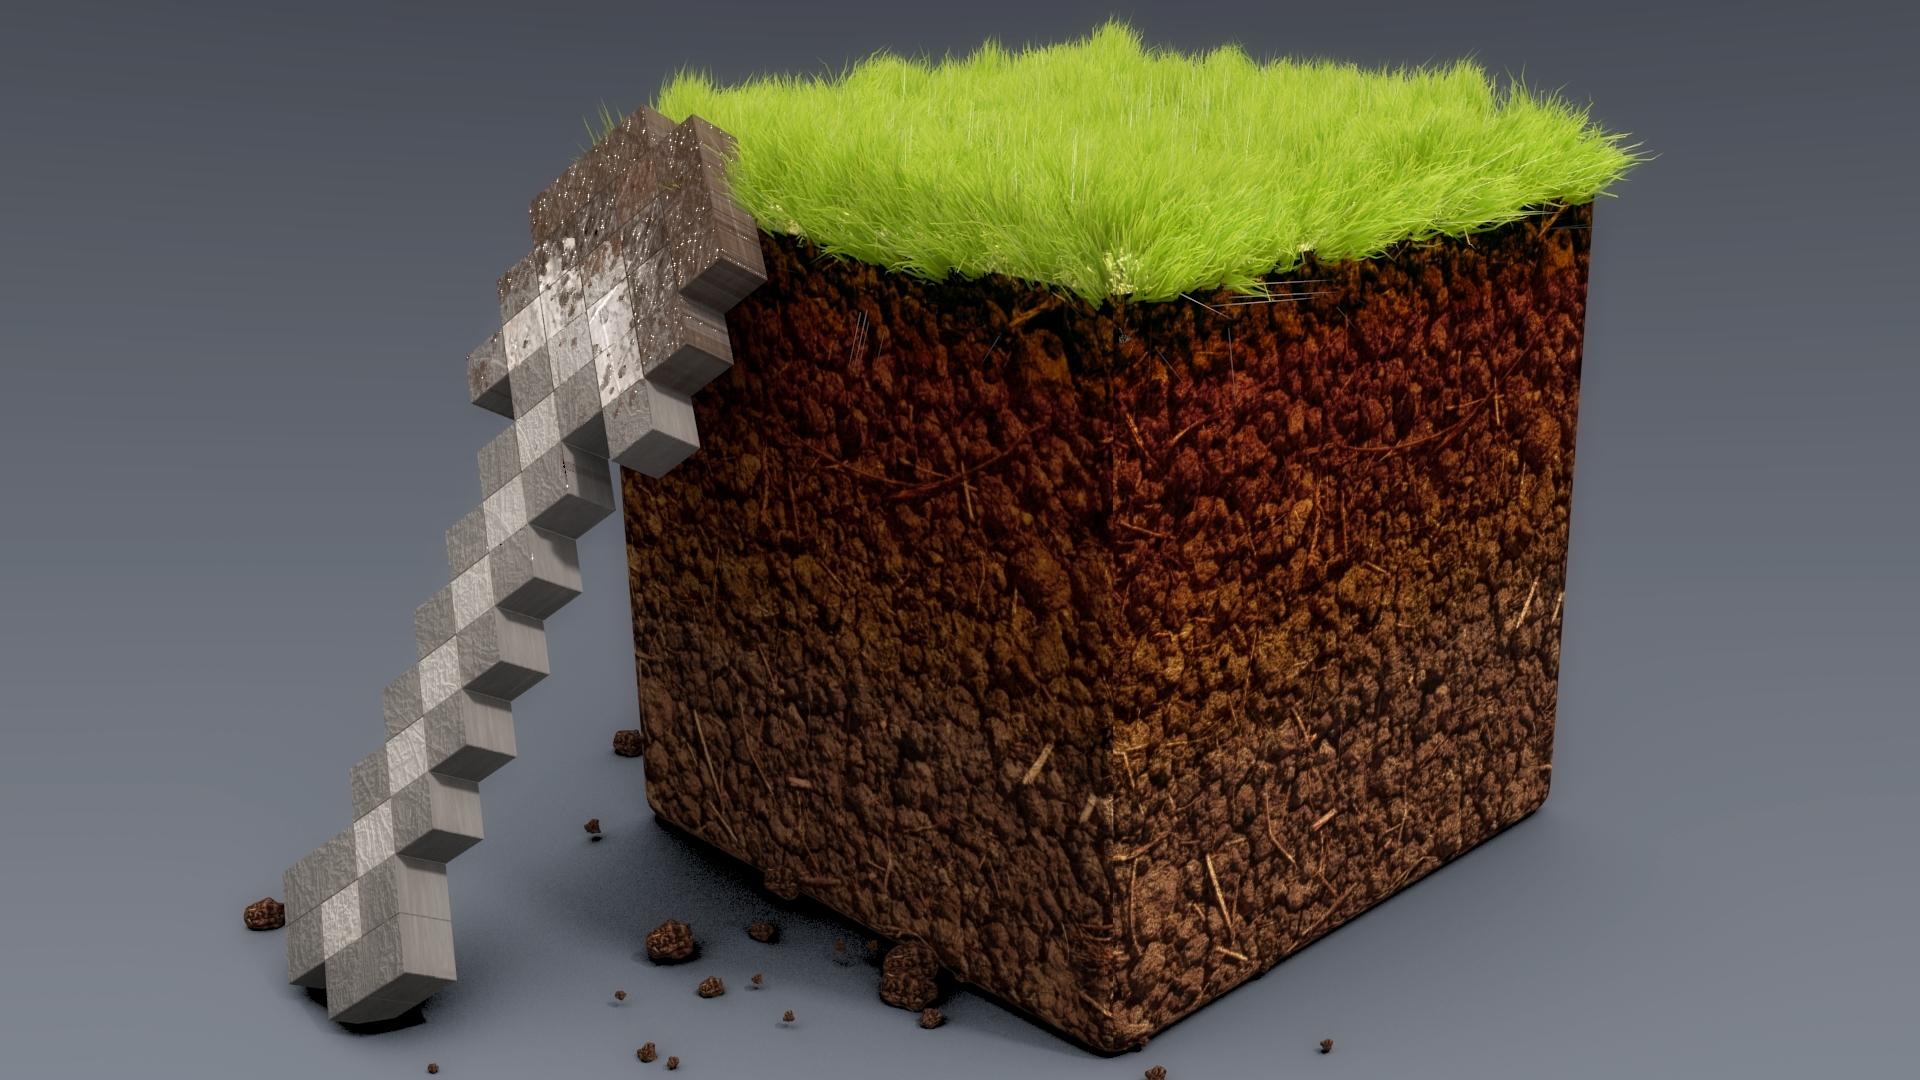 Best Wallpaper Minecraft Real Life - minecraft_ground_grass_cube_21185_1920x1080  Image_321034.jpg